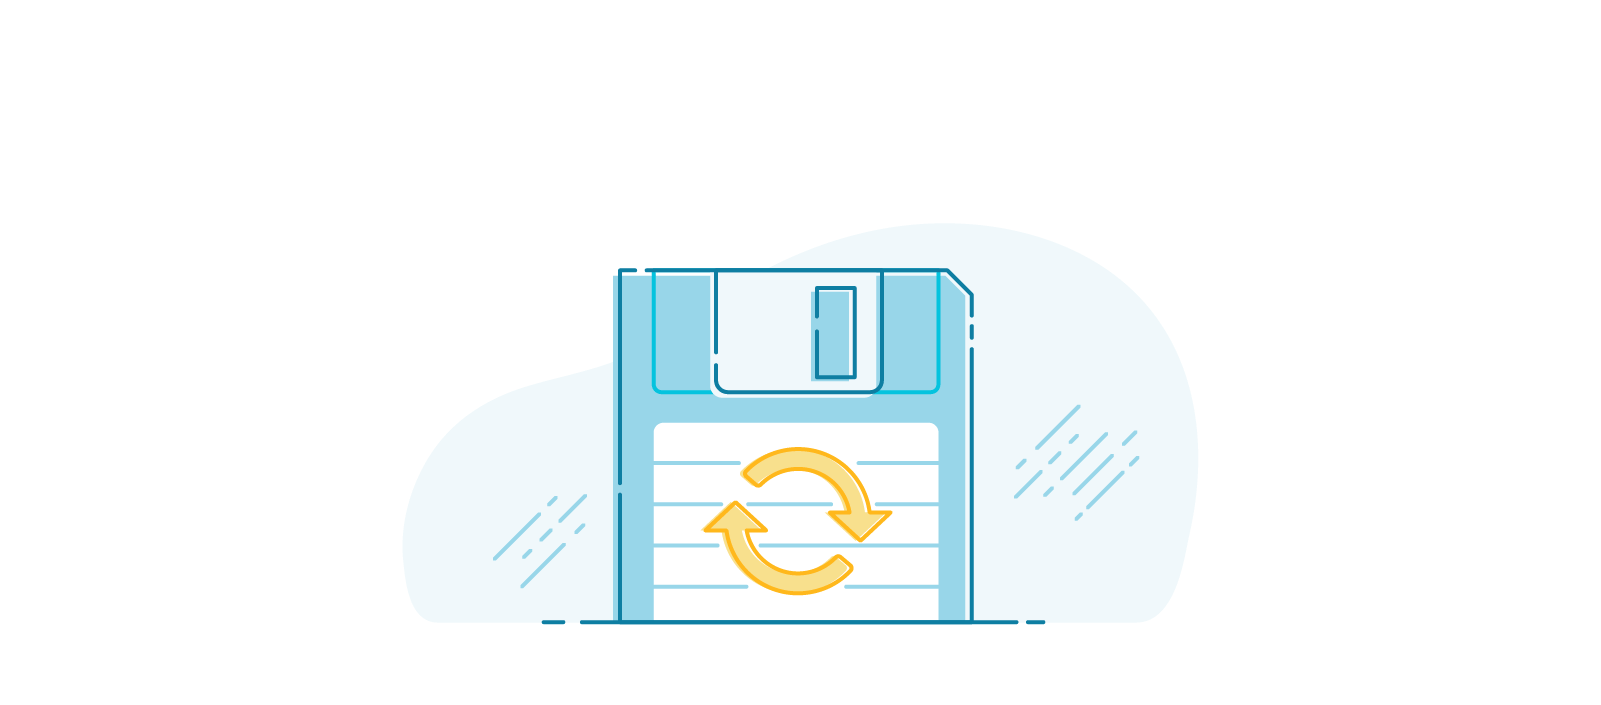 Illustration of an old floppy disk.